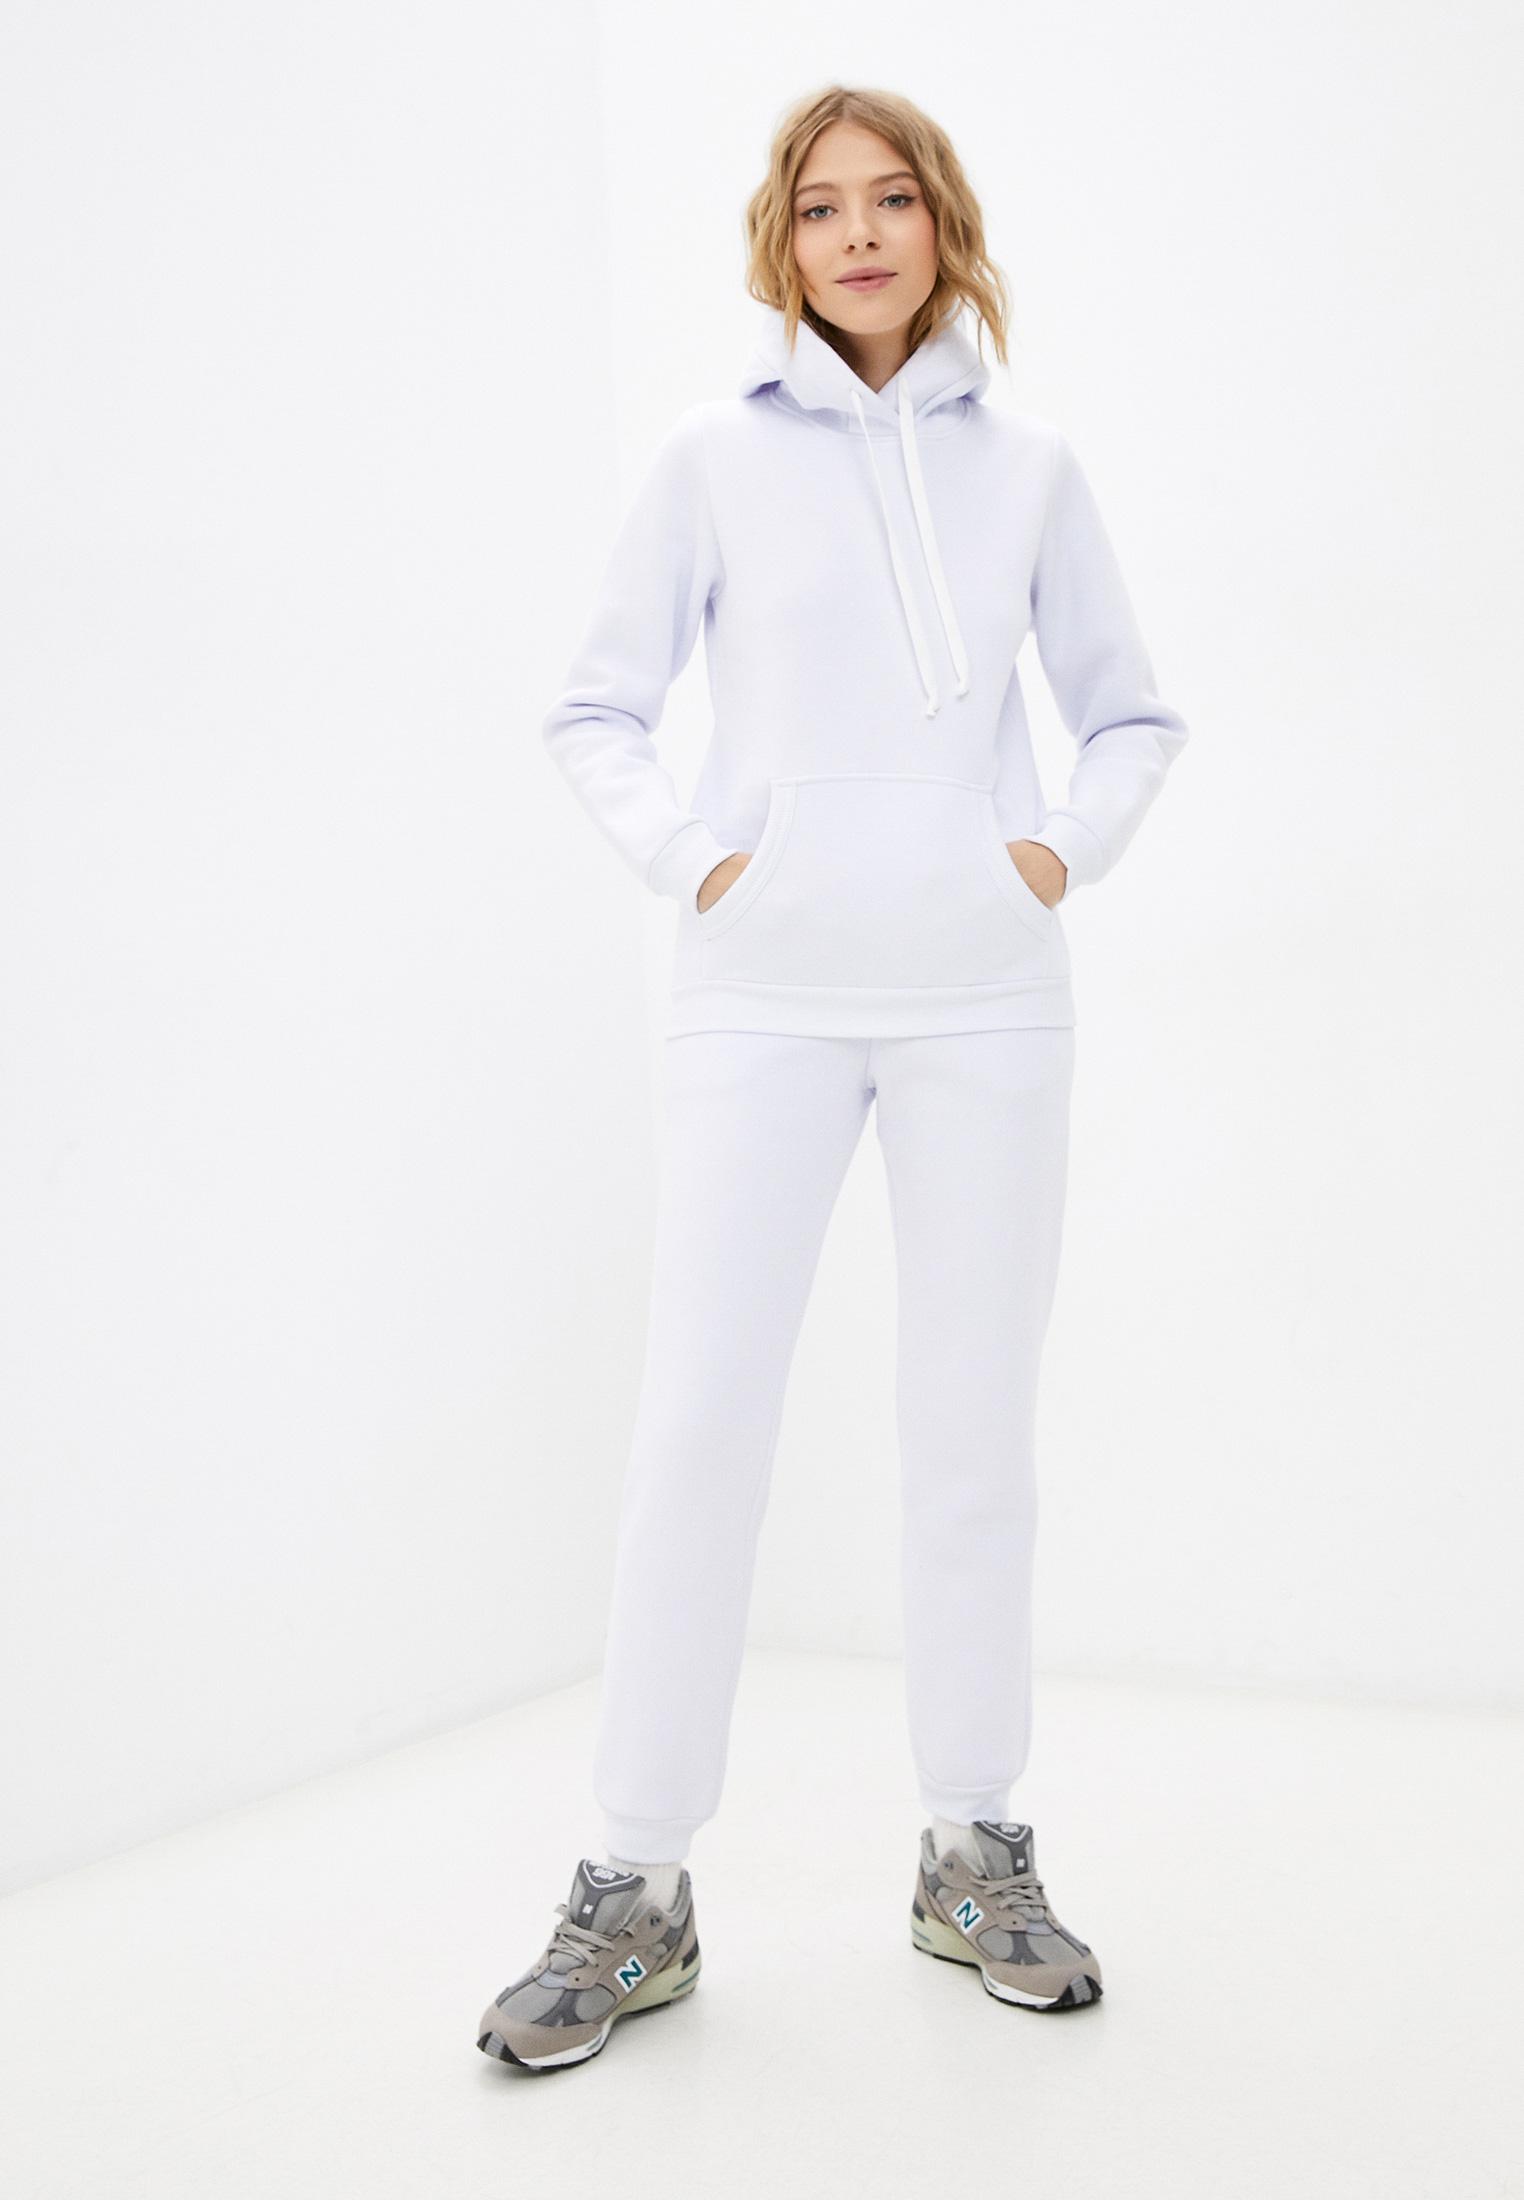 Спортивный костюм Toku Tino Костюм спортивный Toku Tino